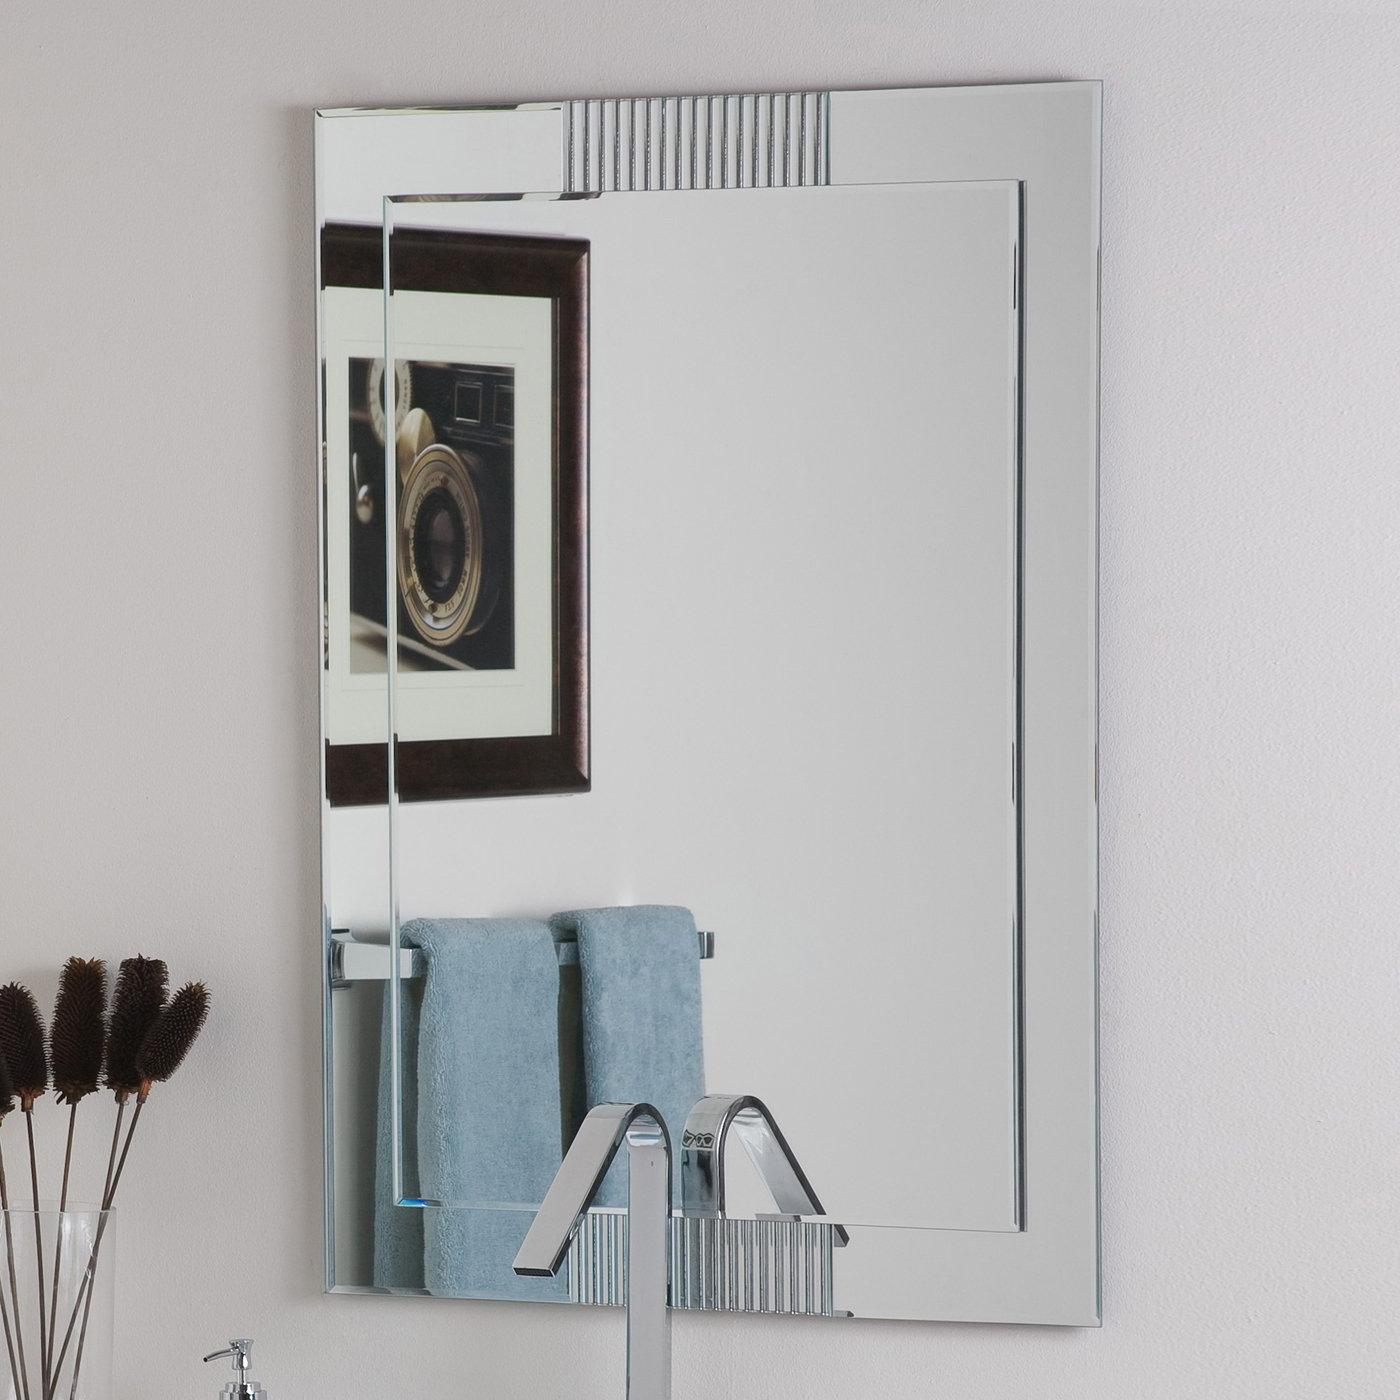 Decor Wonderland Francisca Large Frameless Wall Mirror For Well Known Large Frameless Wall Mirrors (View 8 of 20)